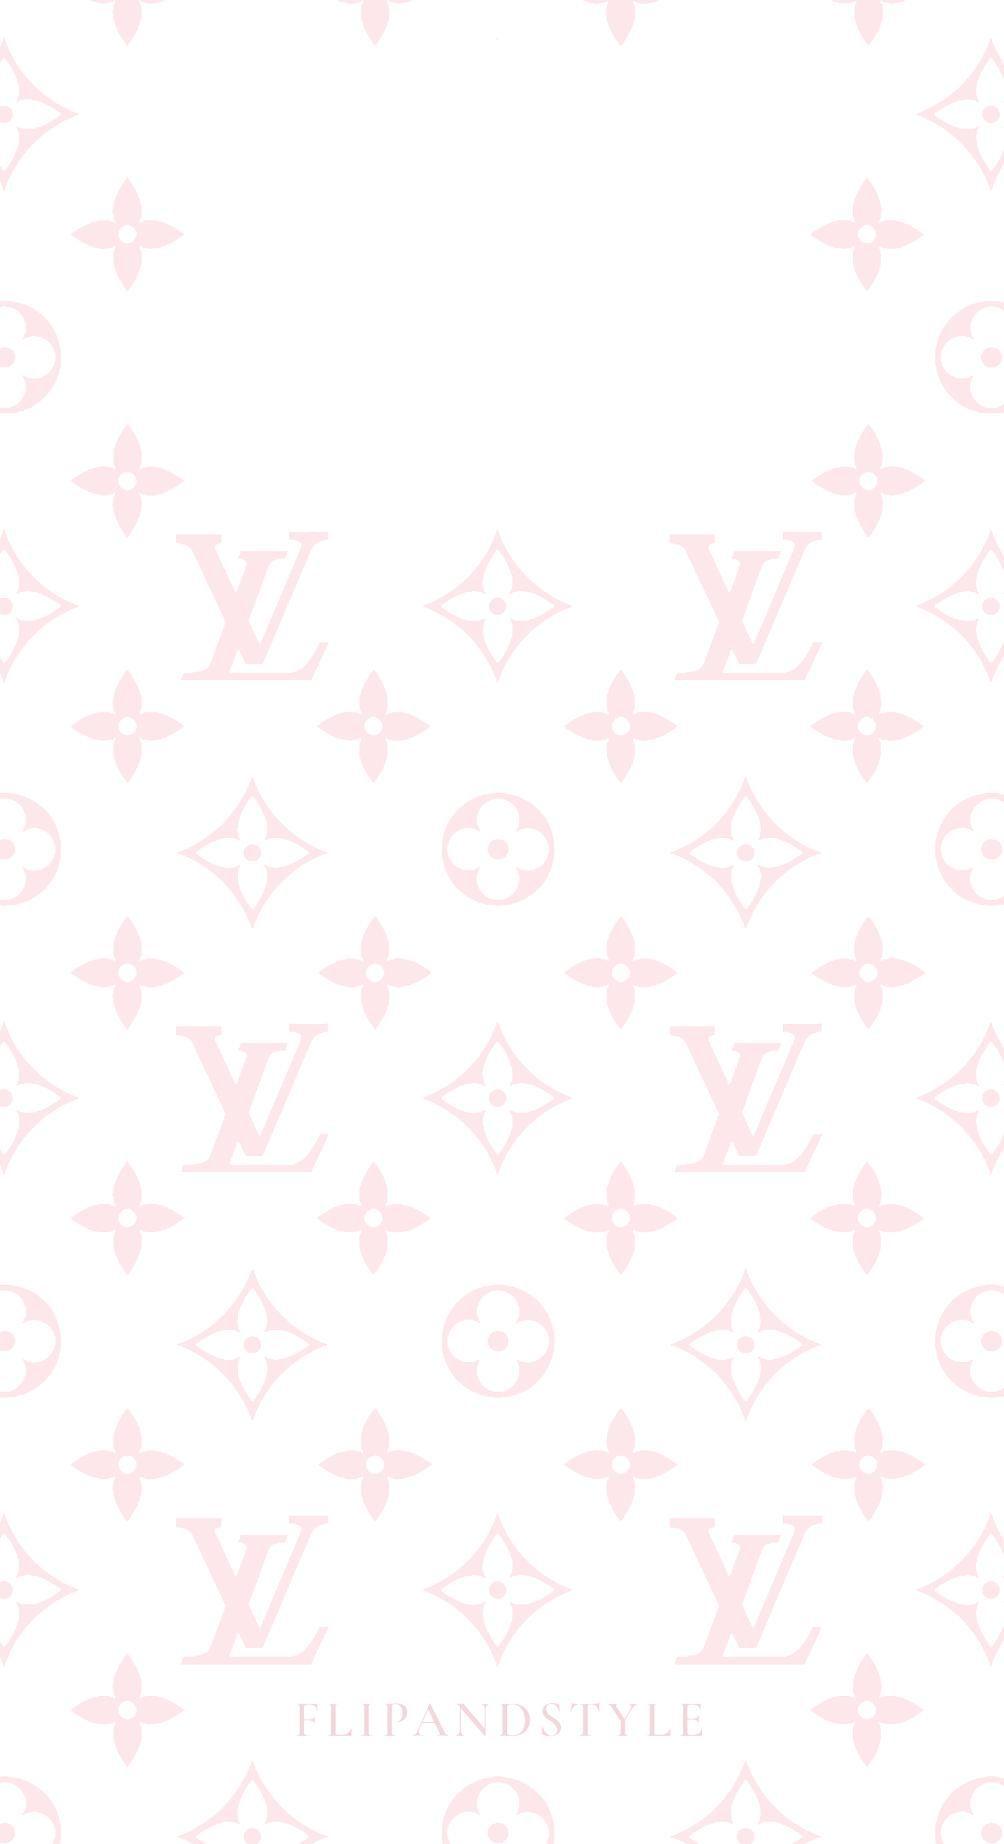 Louis Vuitton Wallpaper Louis Vuitton Backgrounds Free Iphone Wallpapers Free Backgro In 2020 Rose Gold Wallpaper Iphone Gold Wallpaper Iphone Iphone Wallpaper Glitter